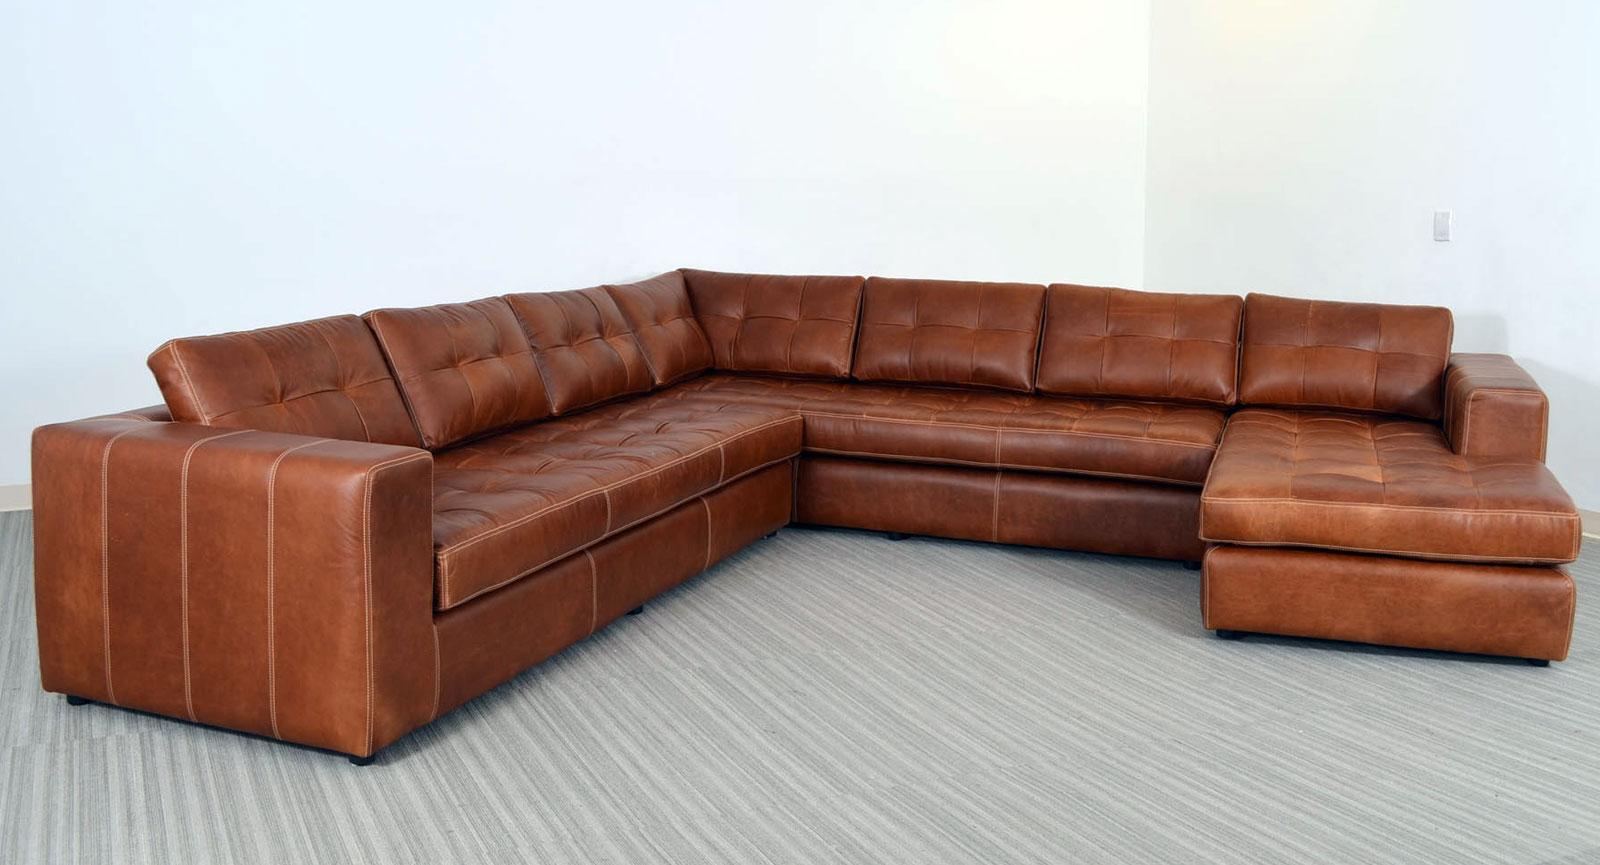 armless white leather sofa most comfortable sleepers 2018 corner 34 with saitama